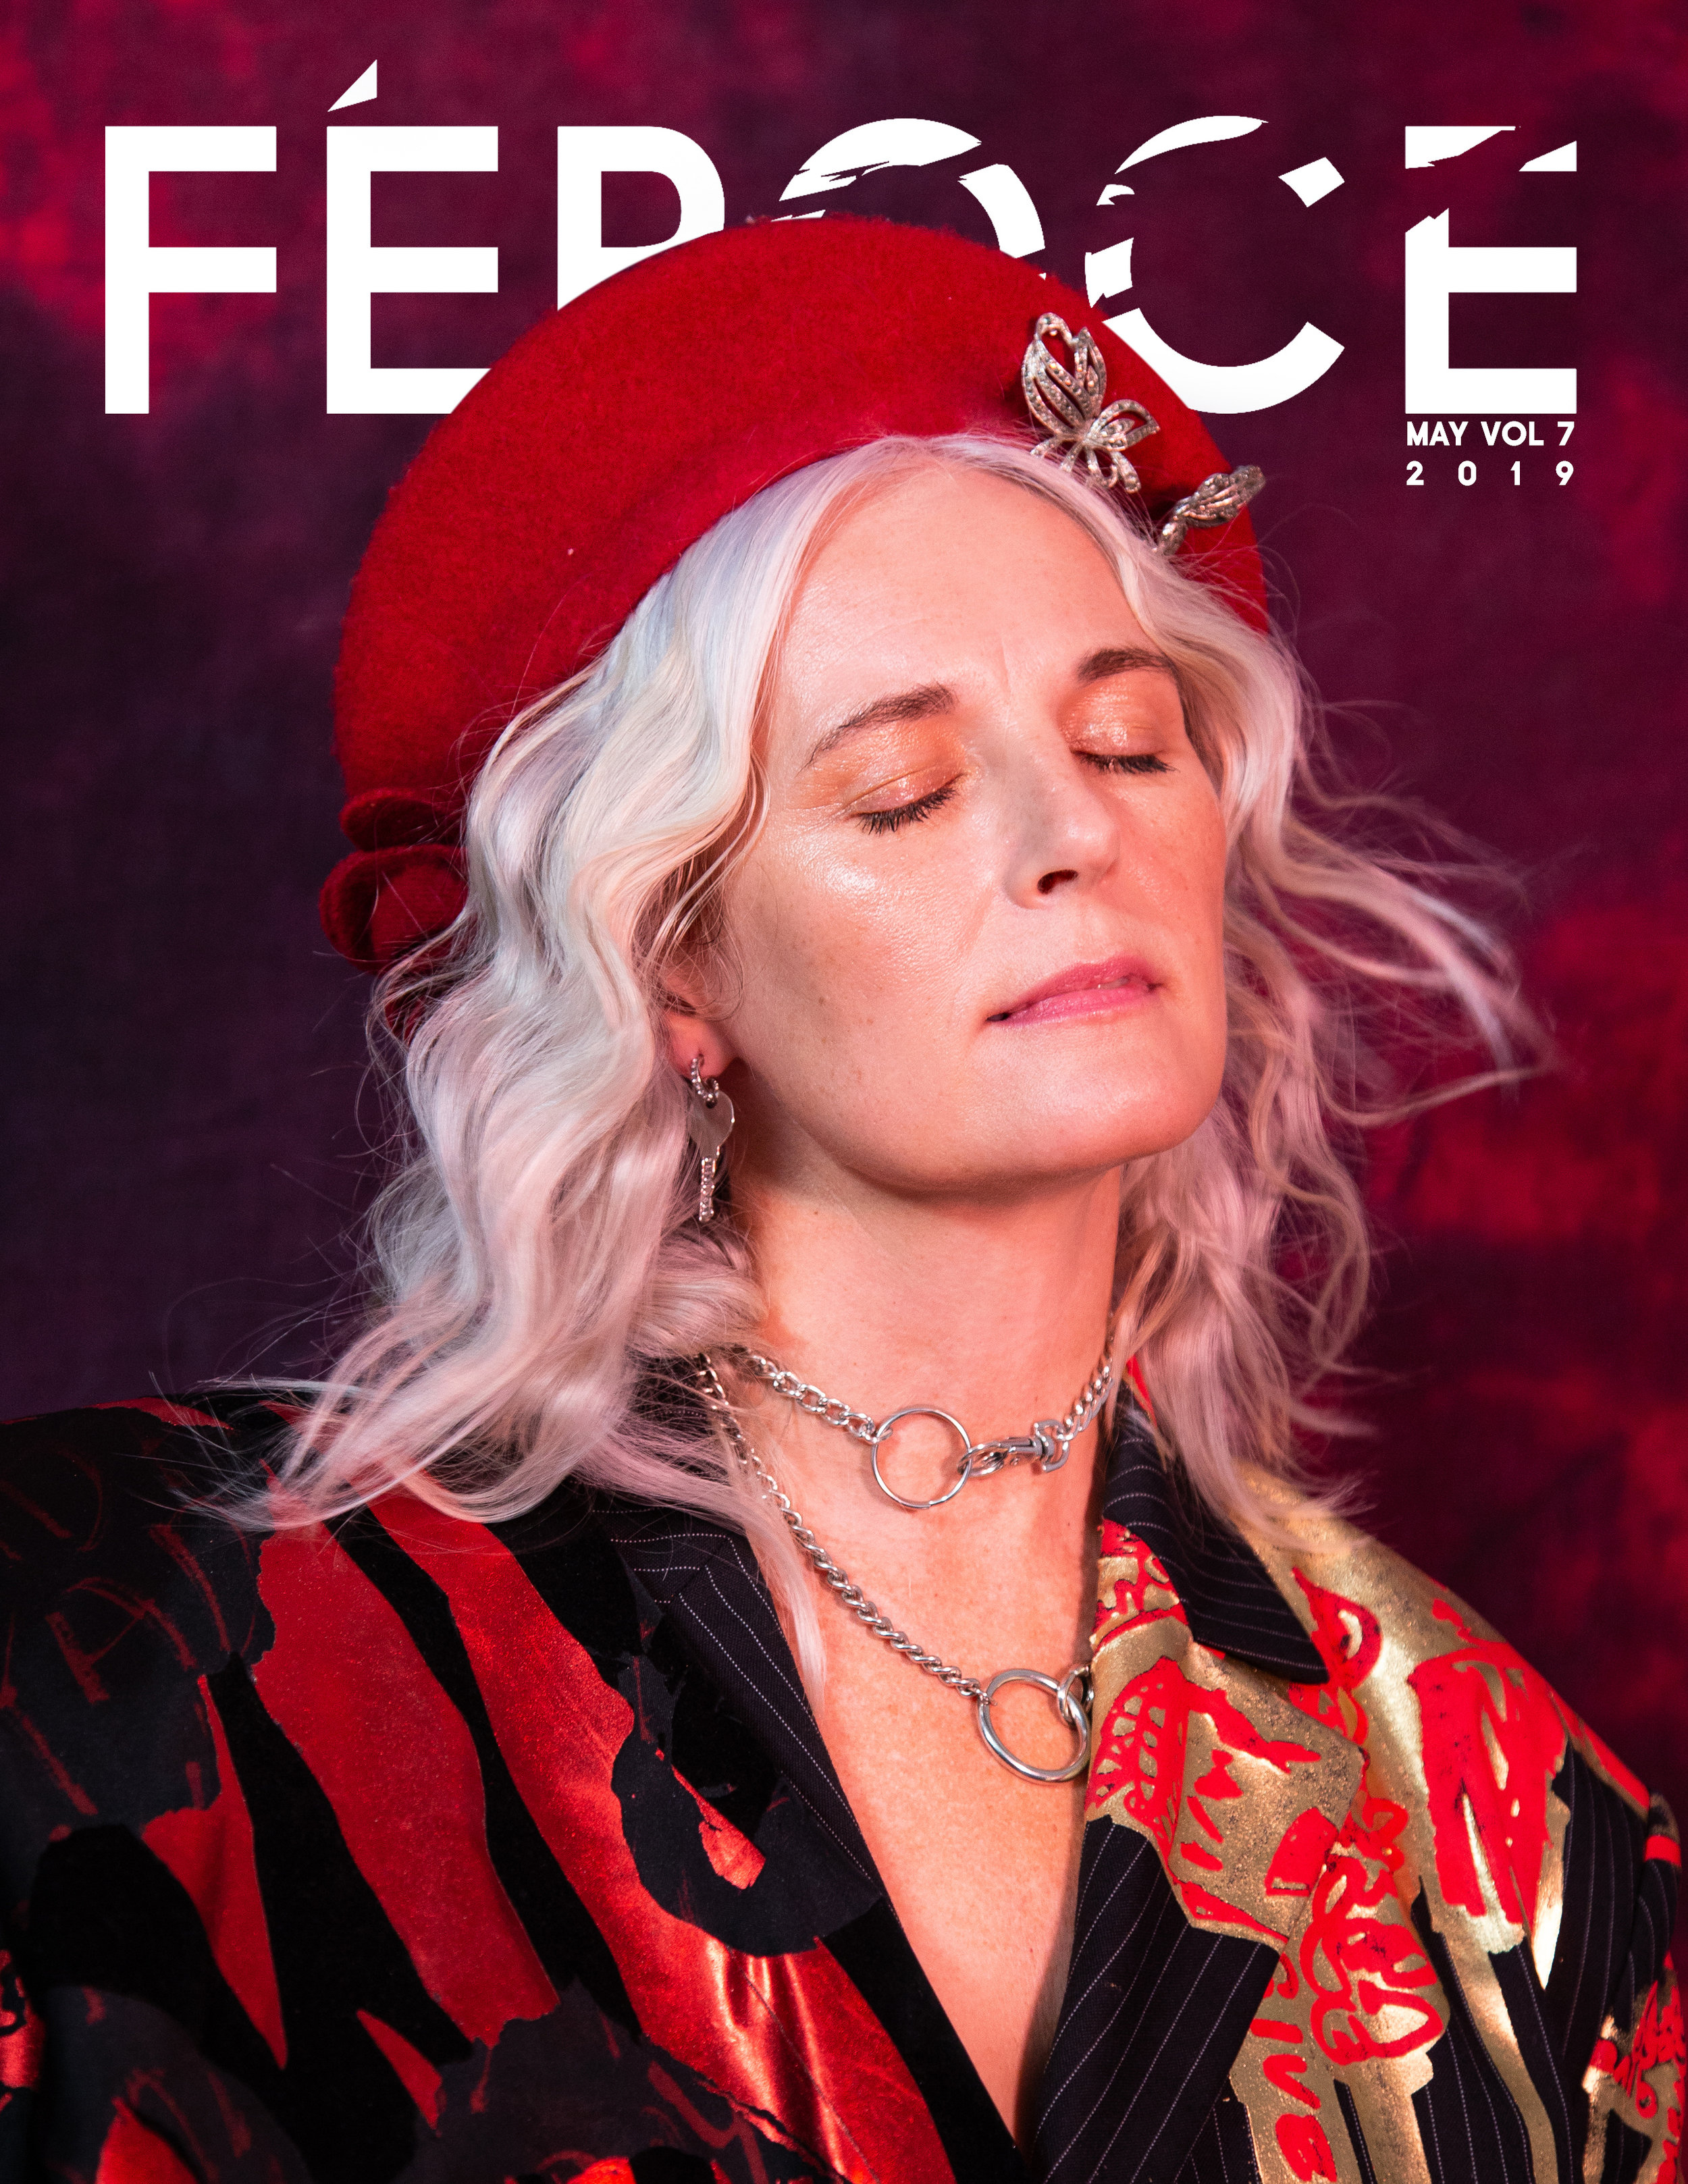 MAY VOL 7 2019 Cover.jpg